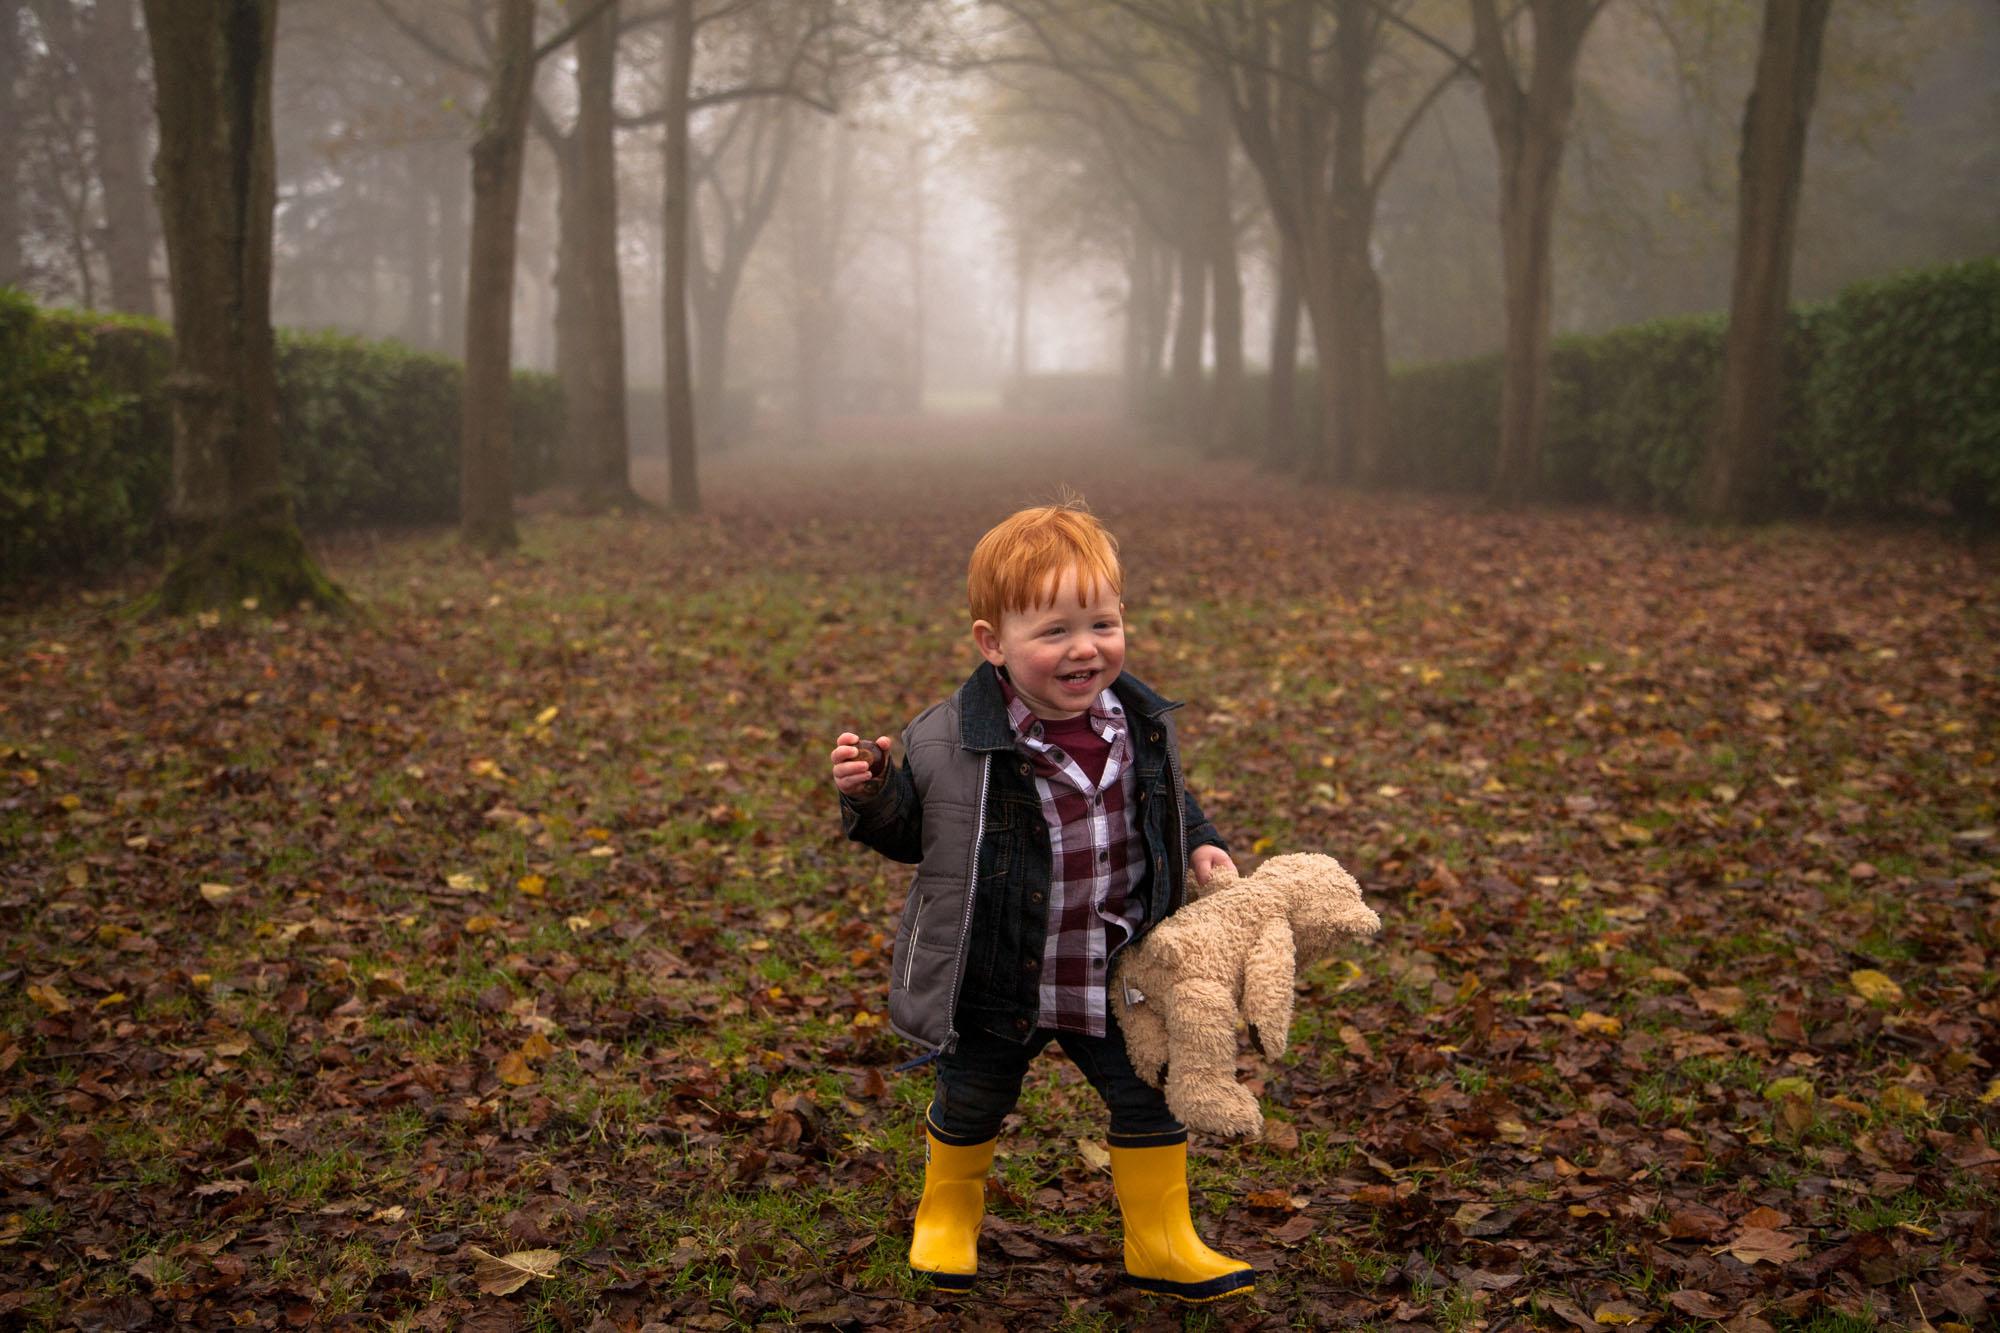 family-life-family-photographer-oxford-london-jonathan-self-photography-3.jpg